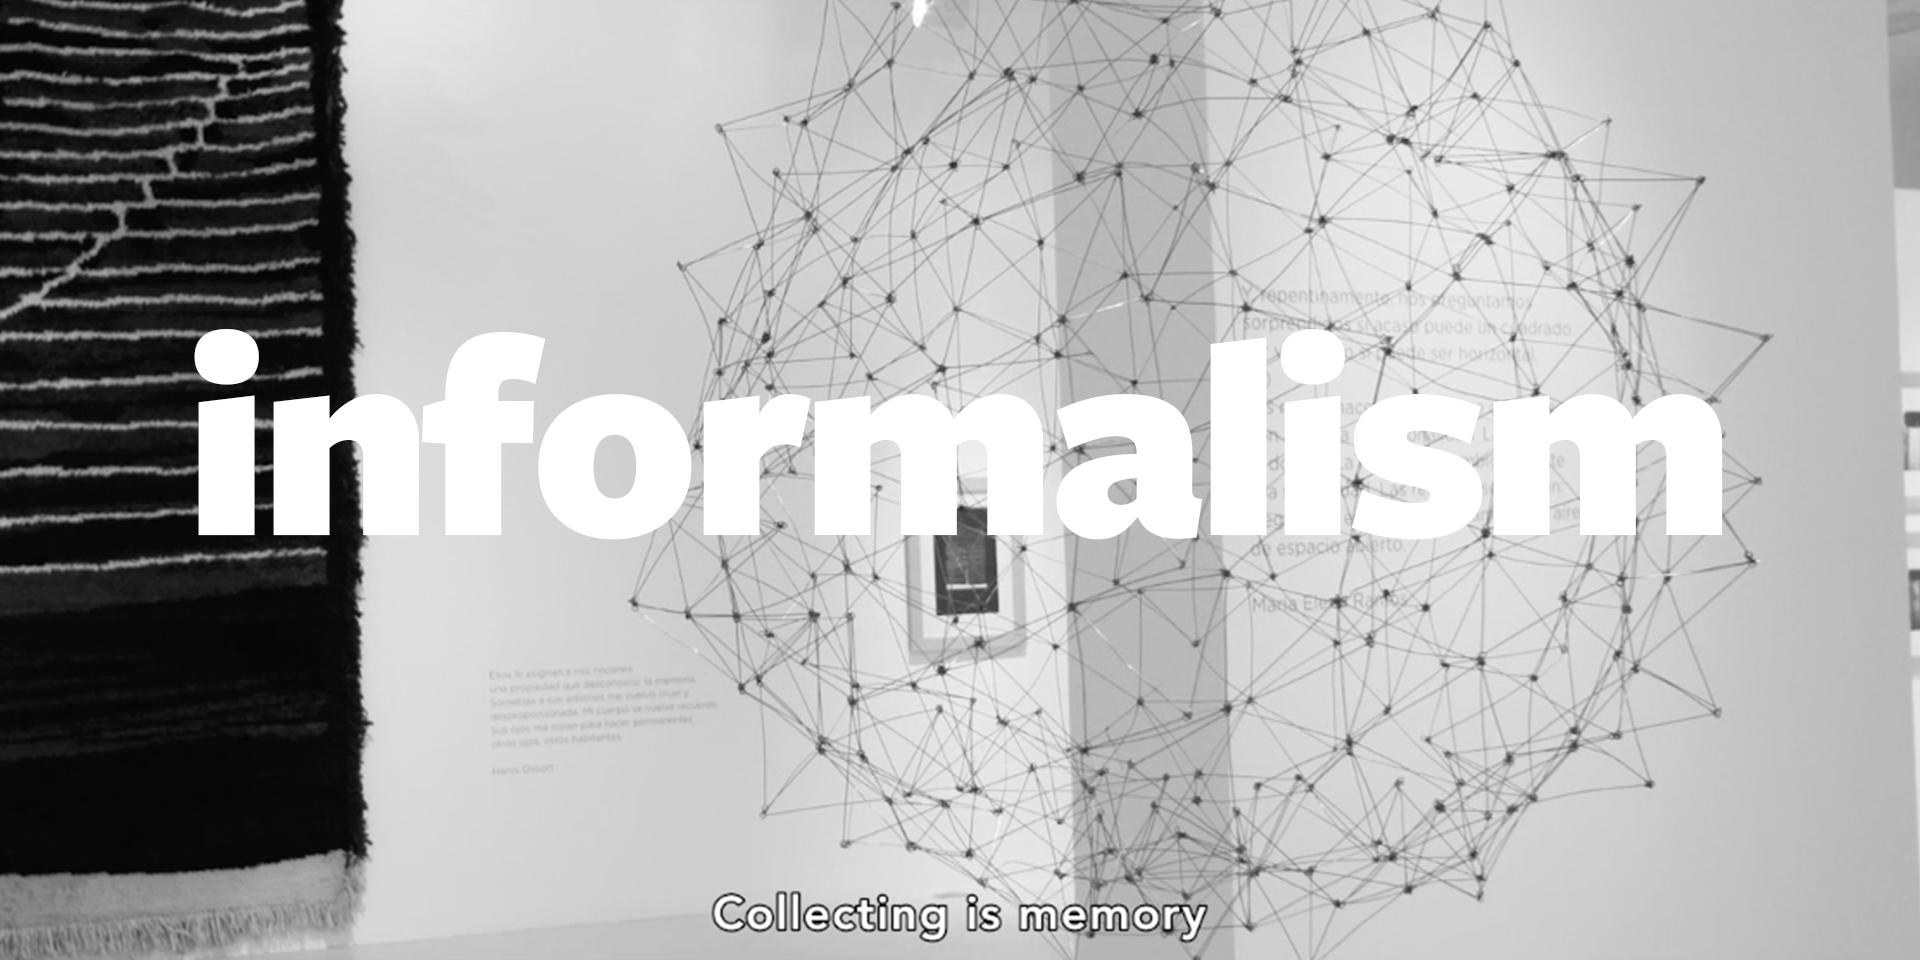 GegoFah_Stillframe_Journal_v01.jpg